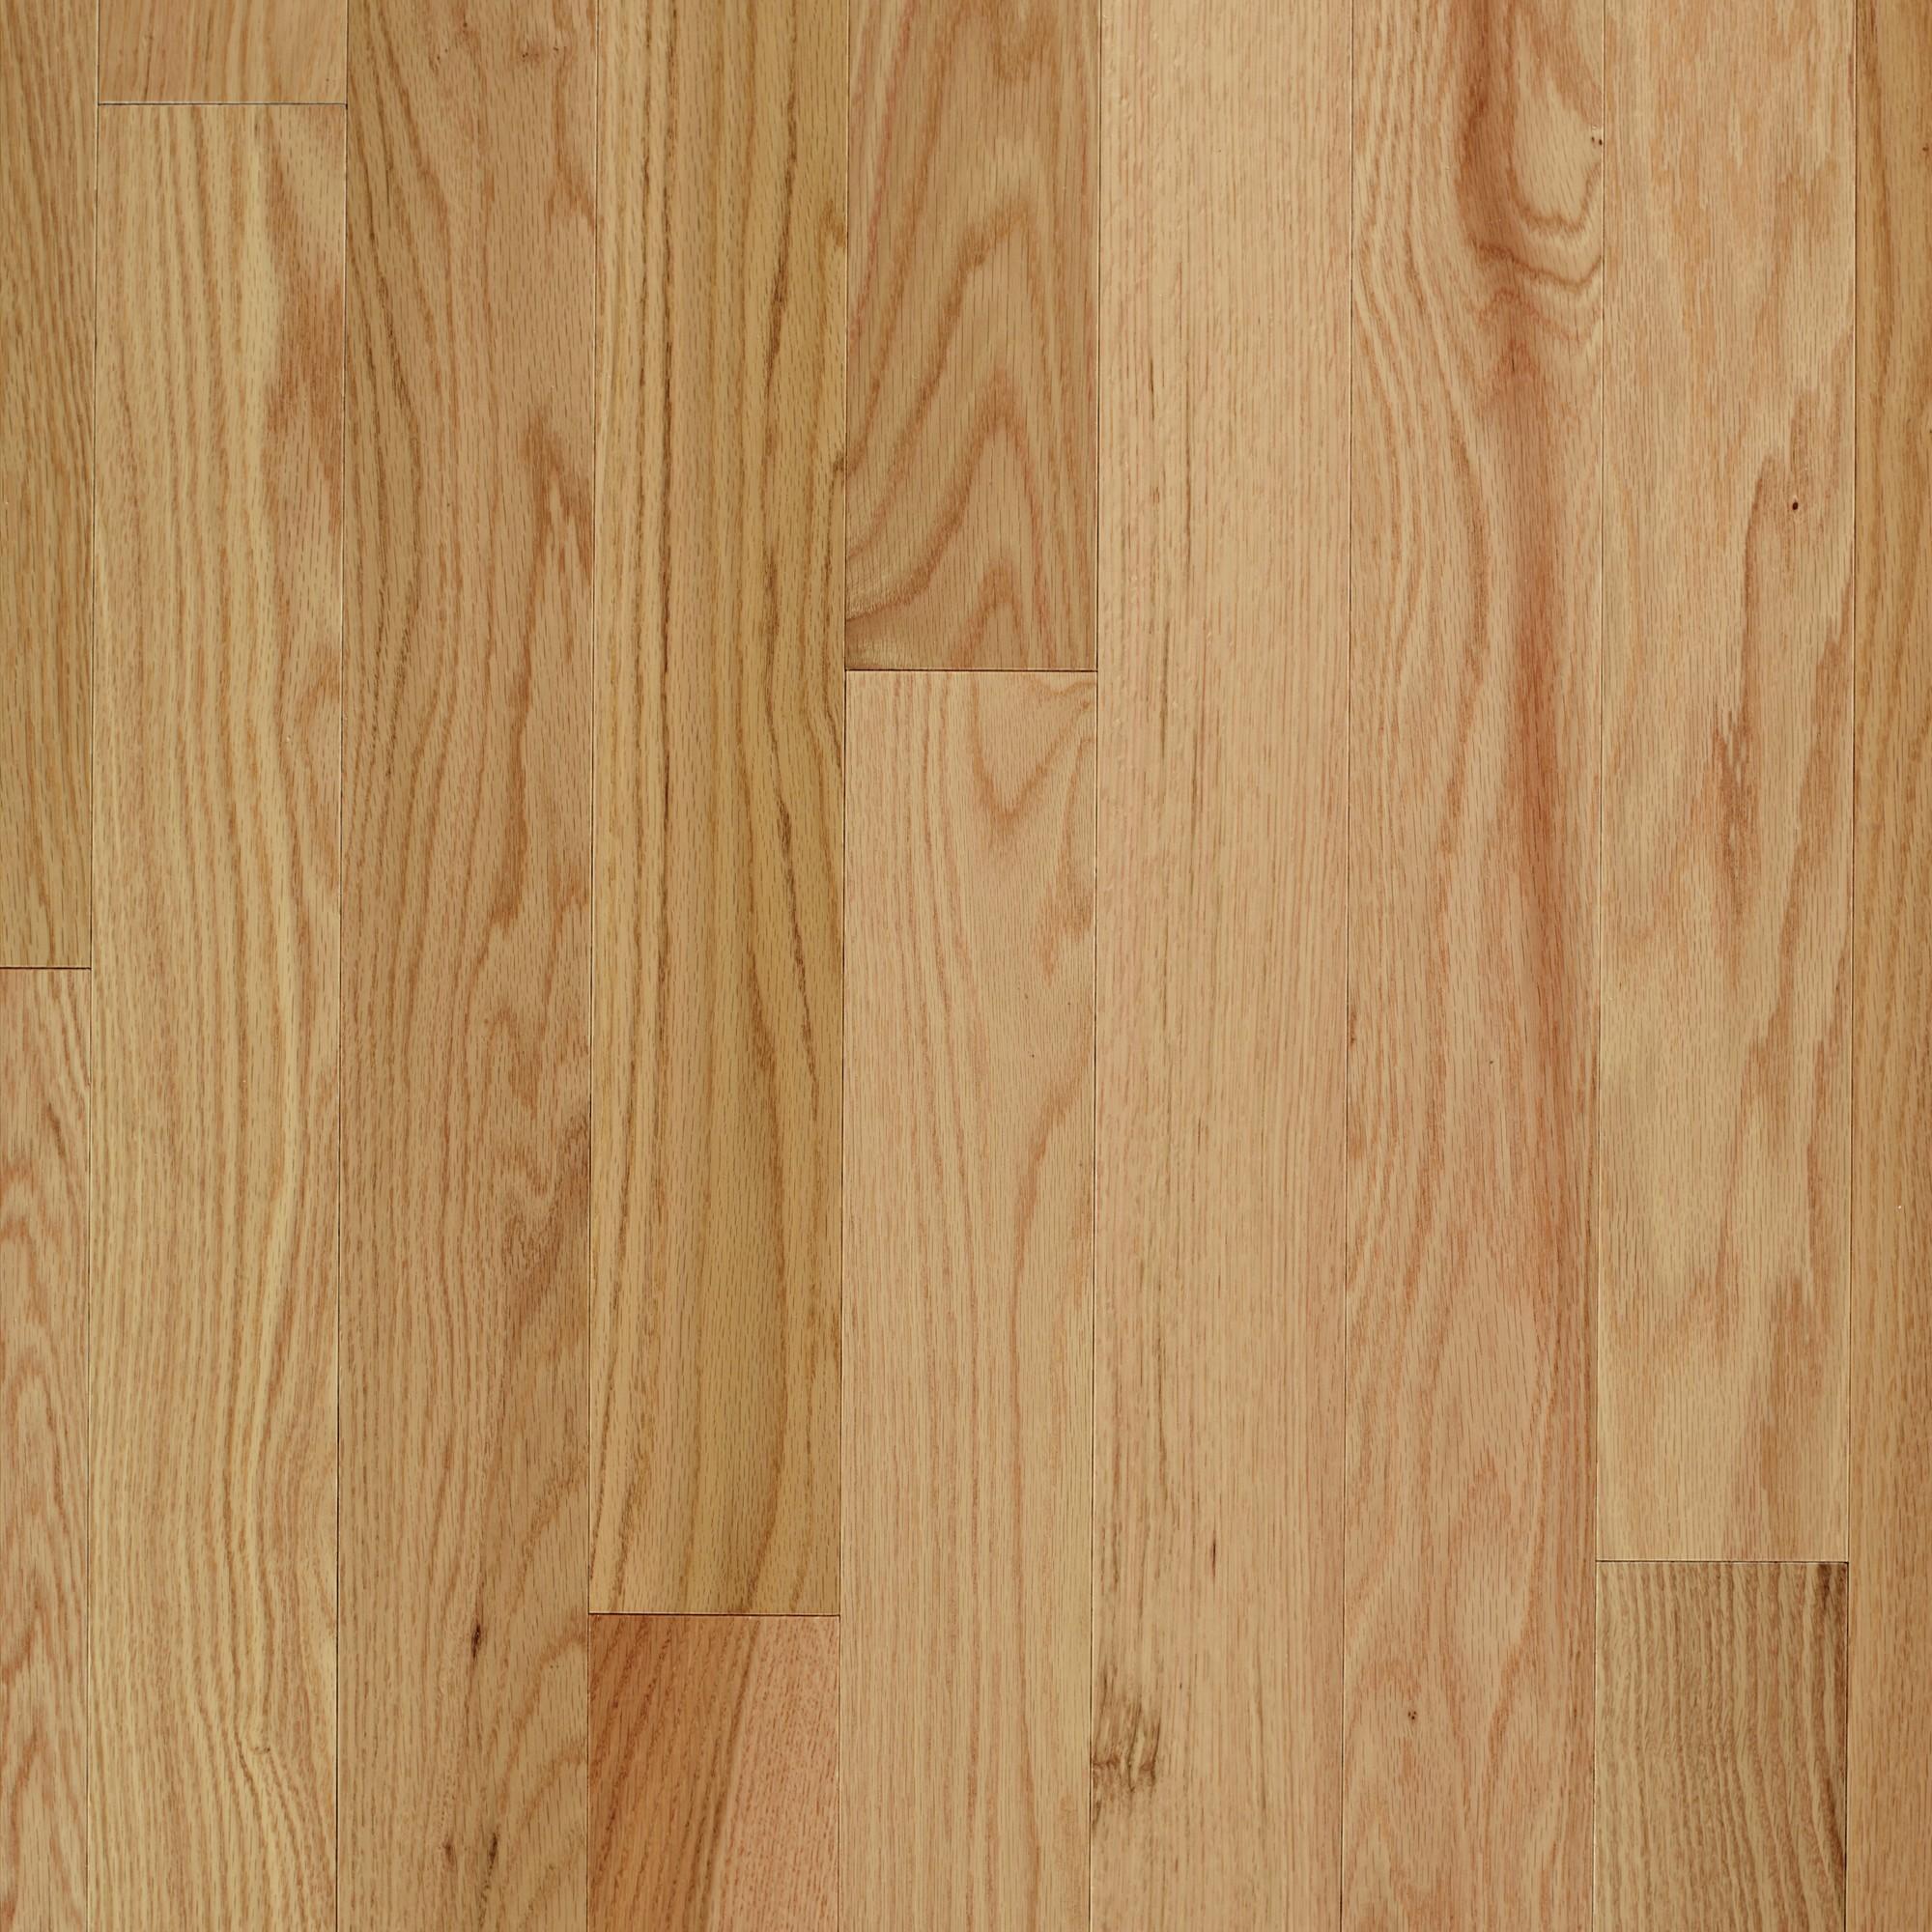 Smooth Red Oak Natural  Vintage Hardwood Flooring and